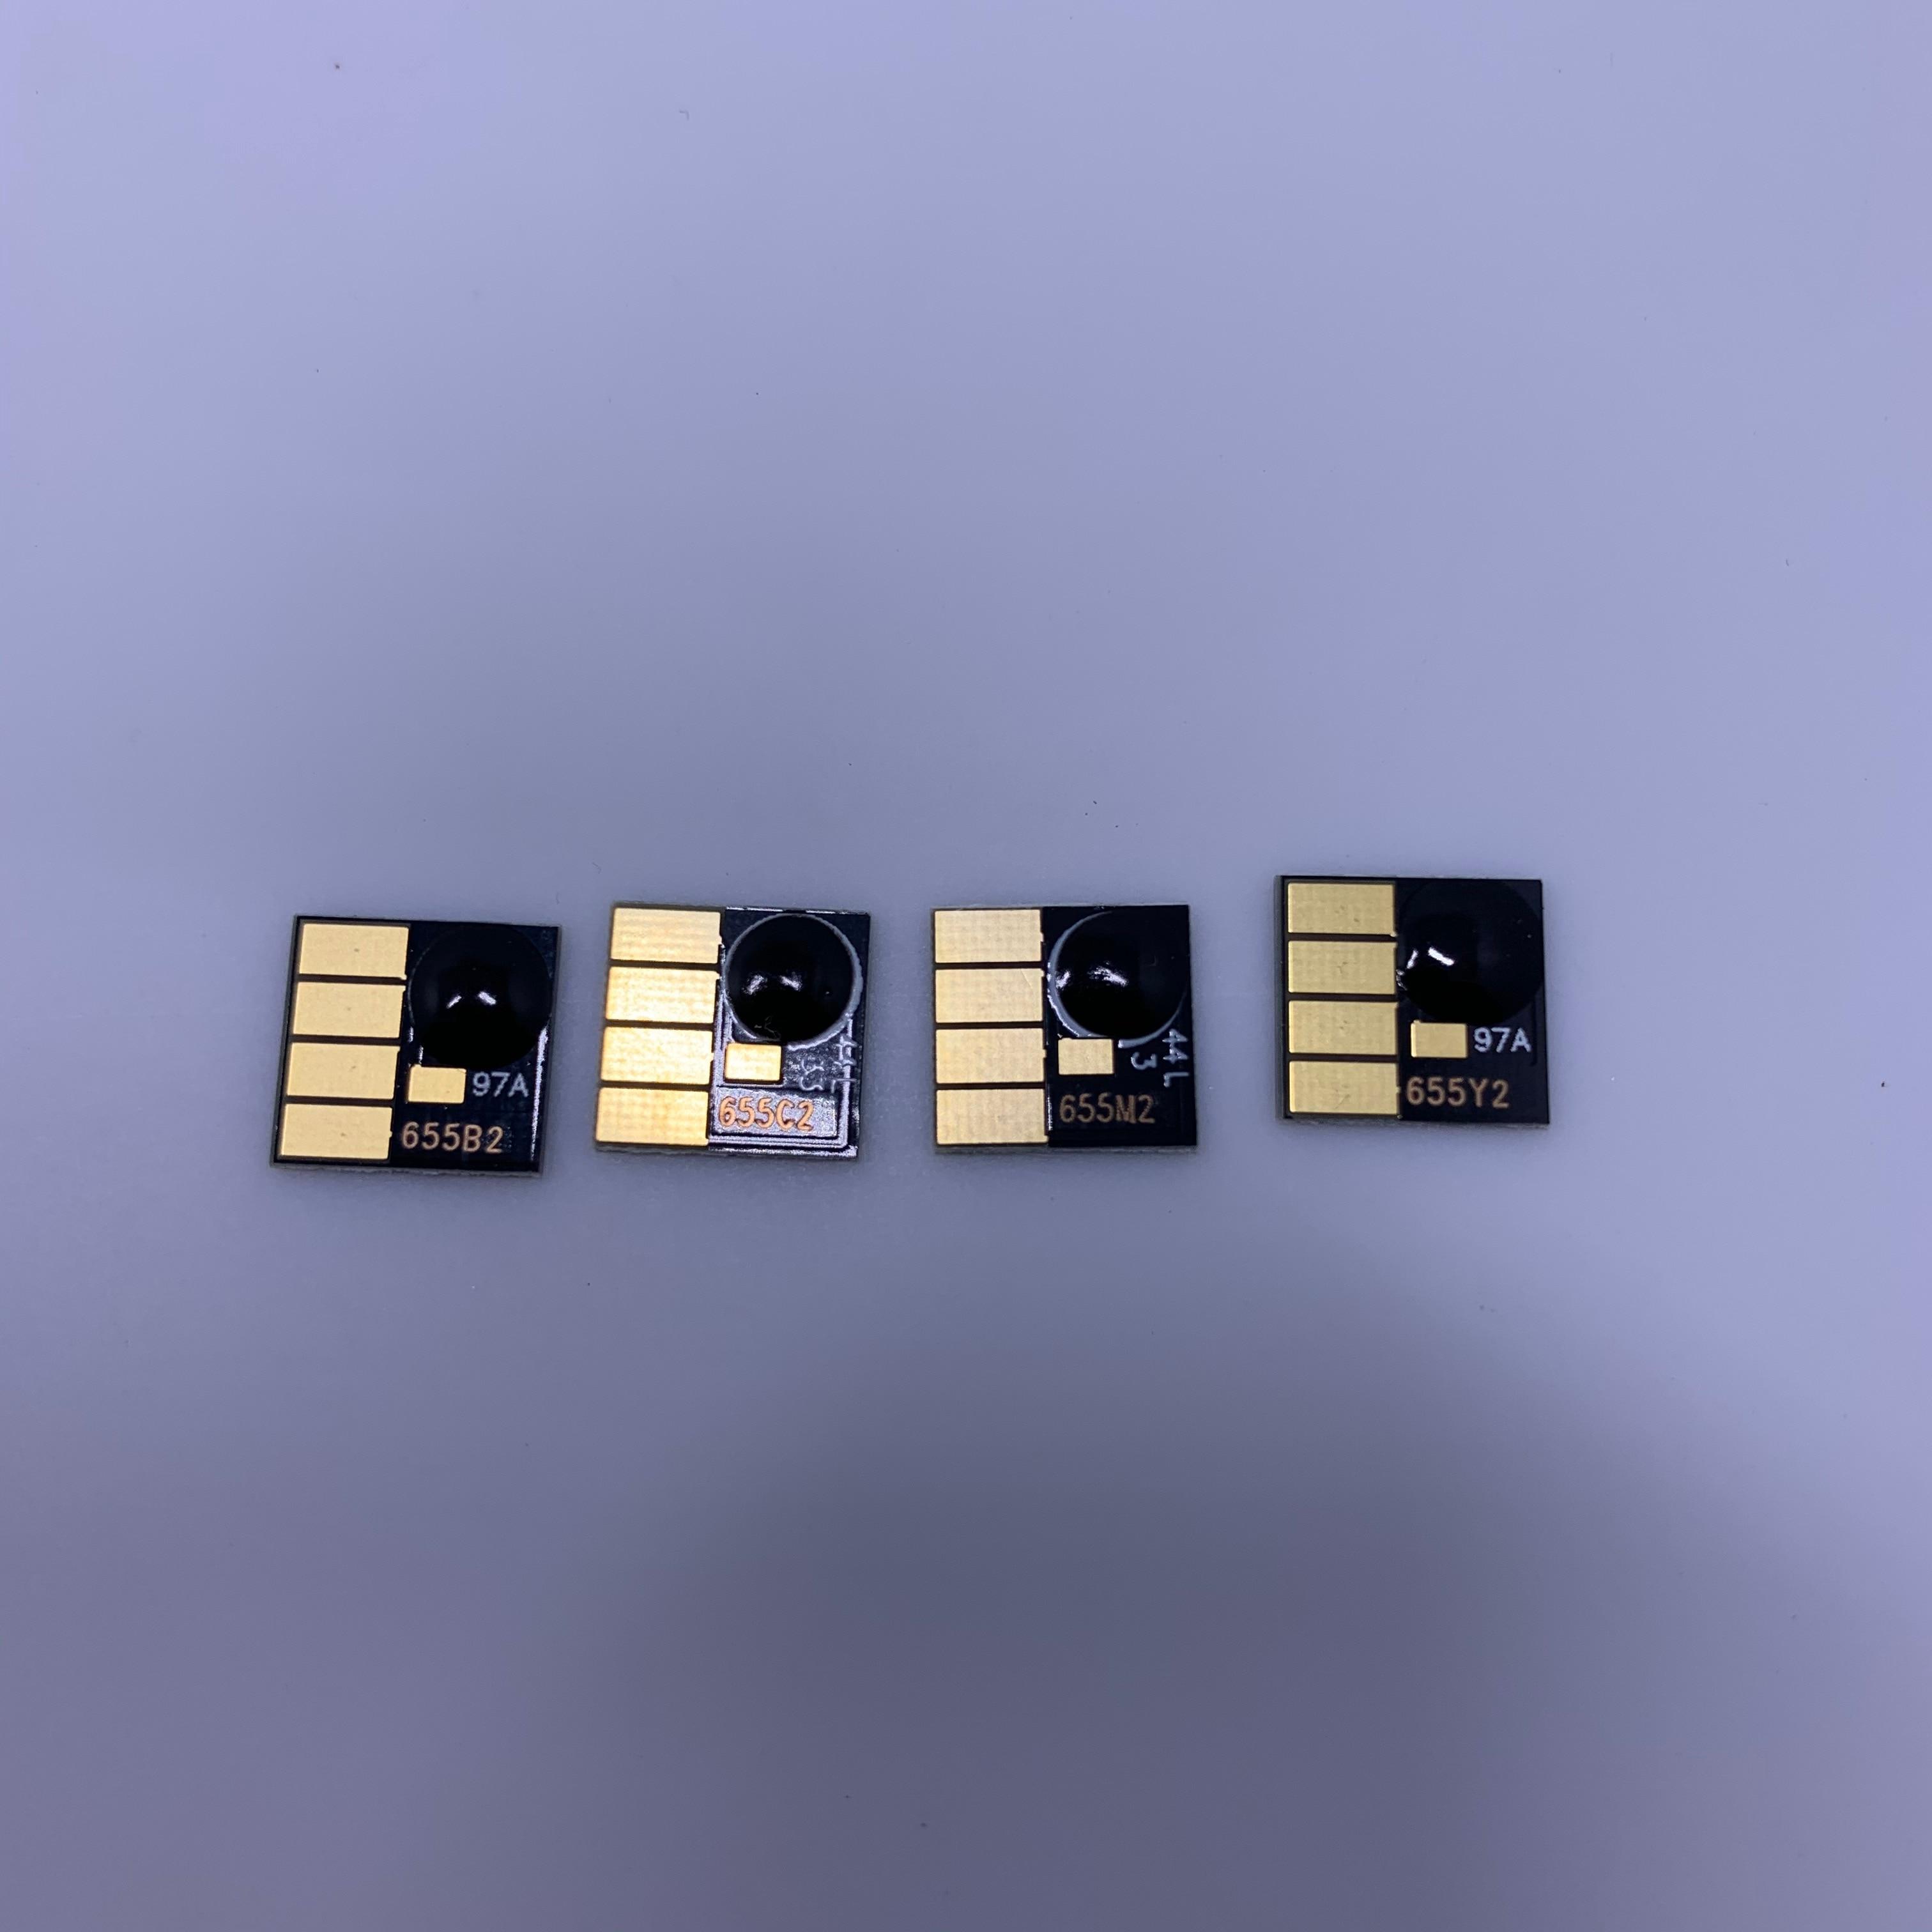 YOTAT 4 шт. Постоянный чип для HP655 HP655XL HP 655 для HP Deskjet Ink Advantage 3525/4615/4625/5525/6520/6525